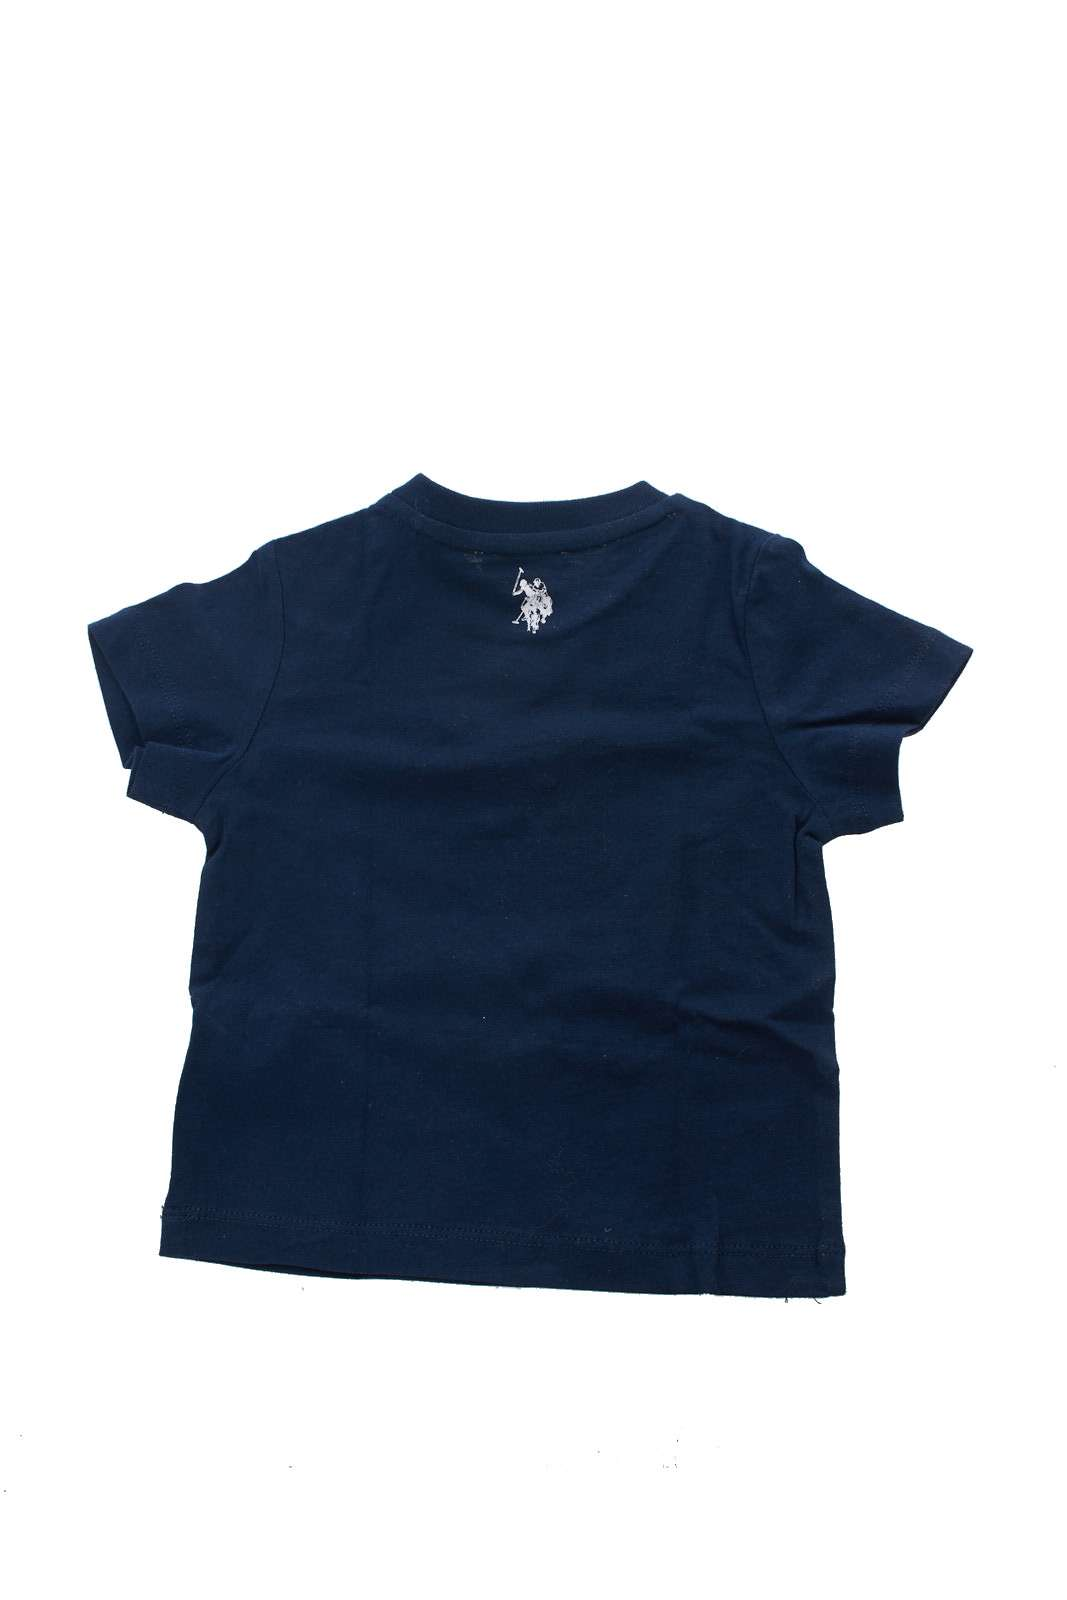 https://www.parmax.com/media/catalog/product/a/i/PE-outlet_parmax-t-shirt-bambino-Us-Polo-33029-B.jpg